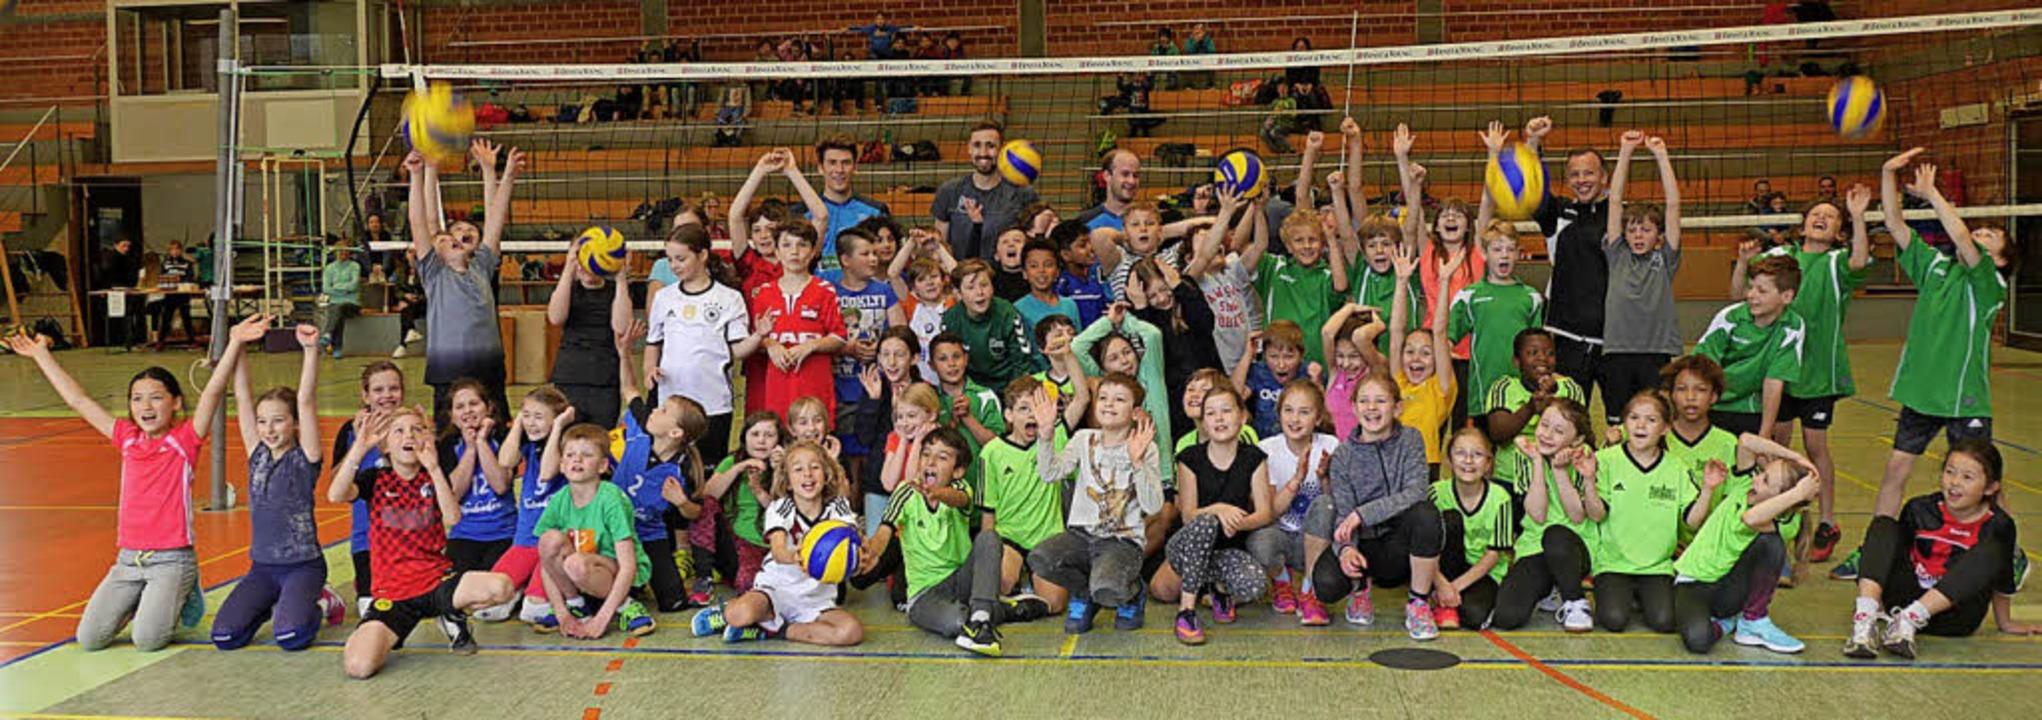 <BZ-FotoAnlauf>Volleyball </BZ-FotoAnl...0 Grundschüler, am besten die Feyels.     Foto: Mack